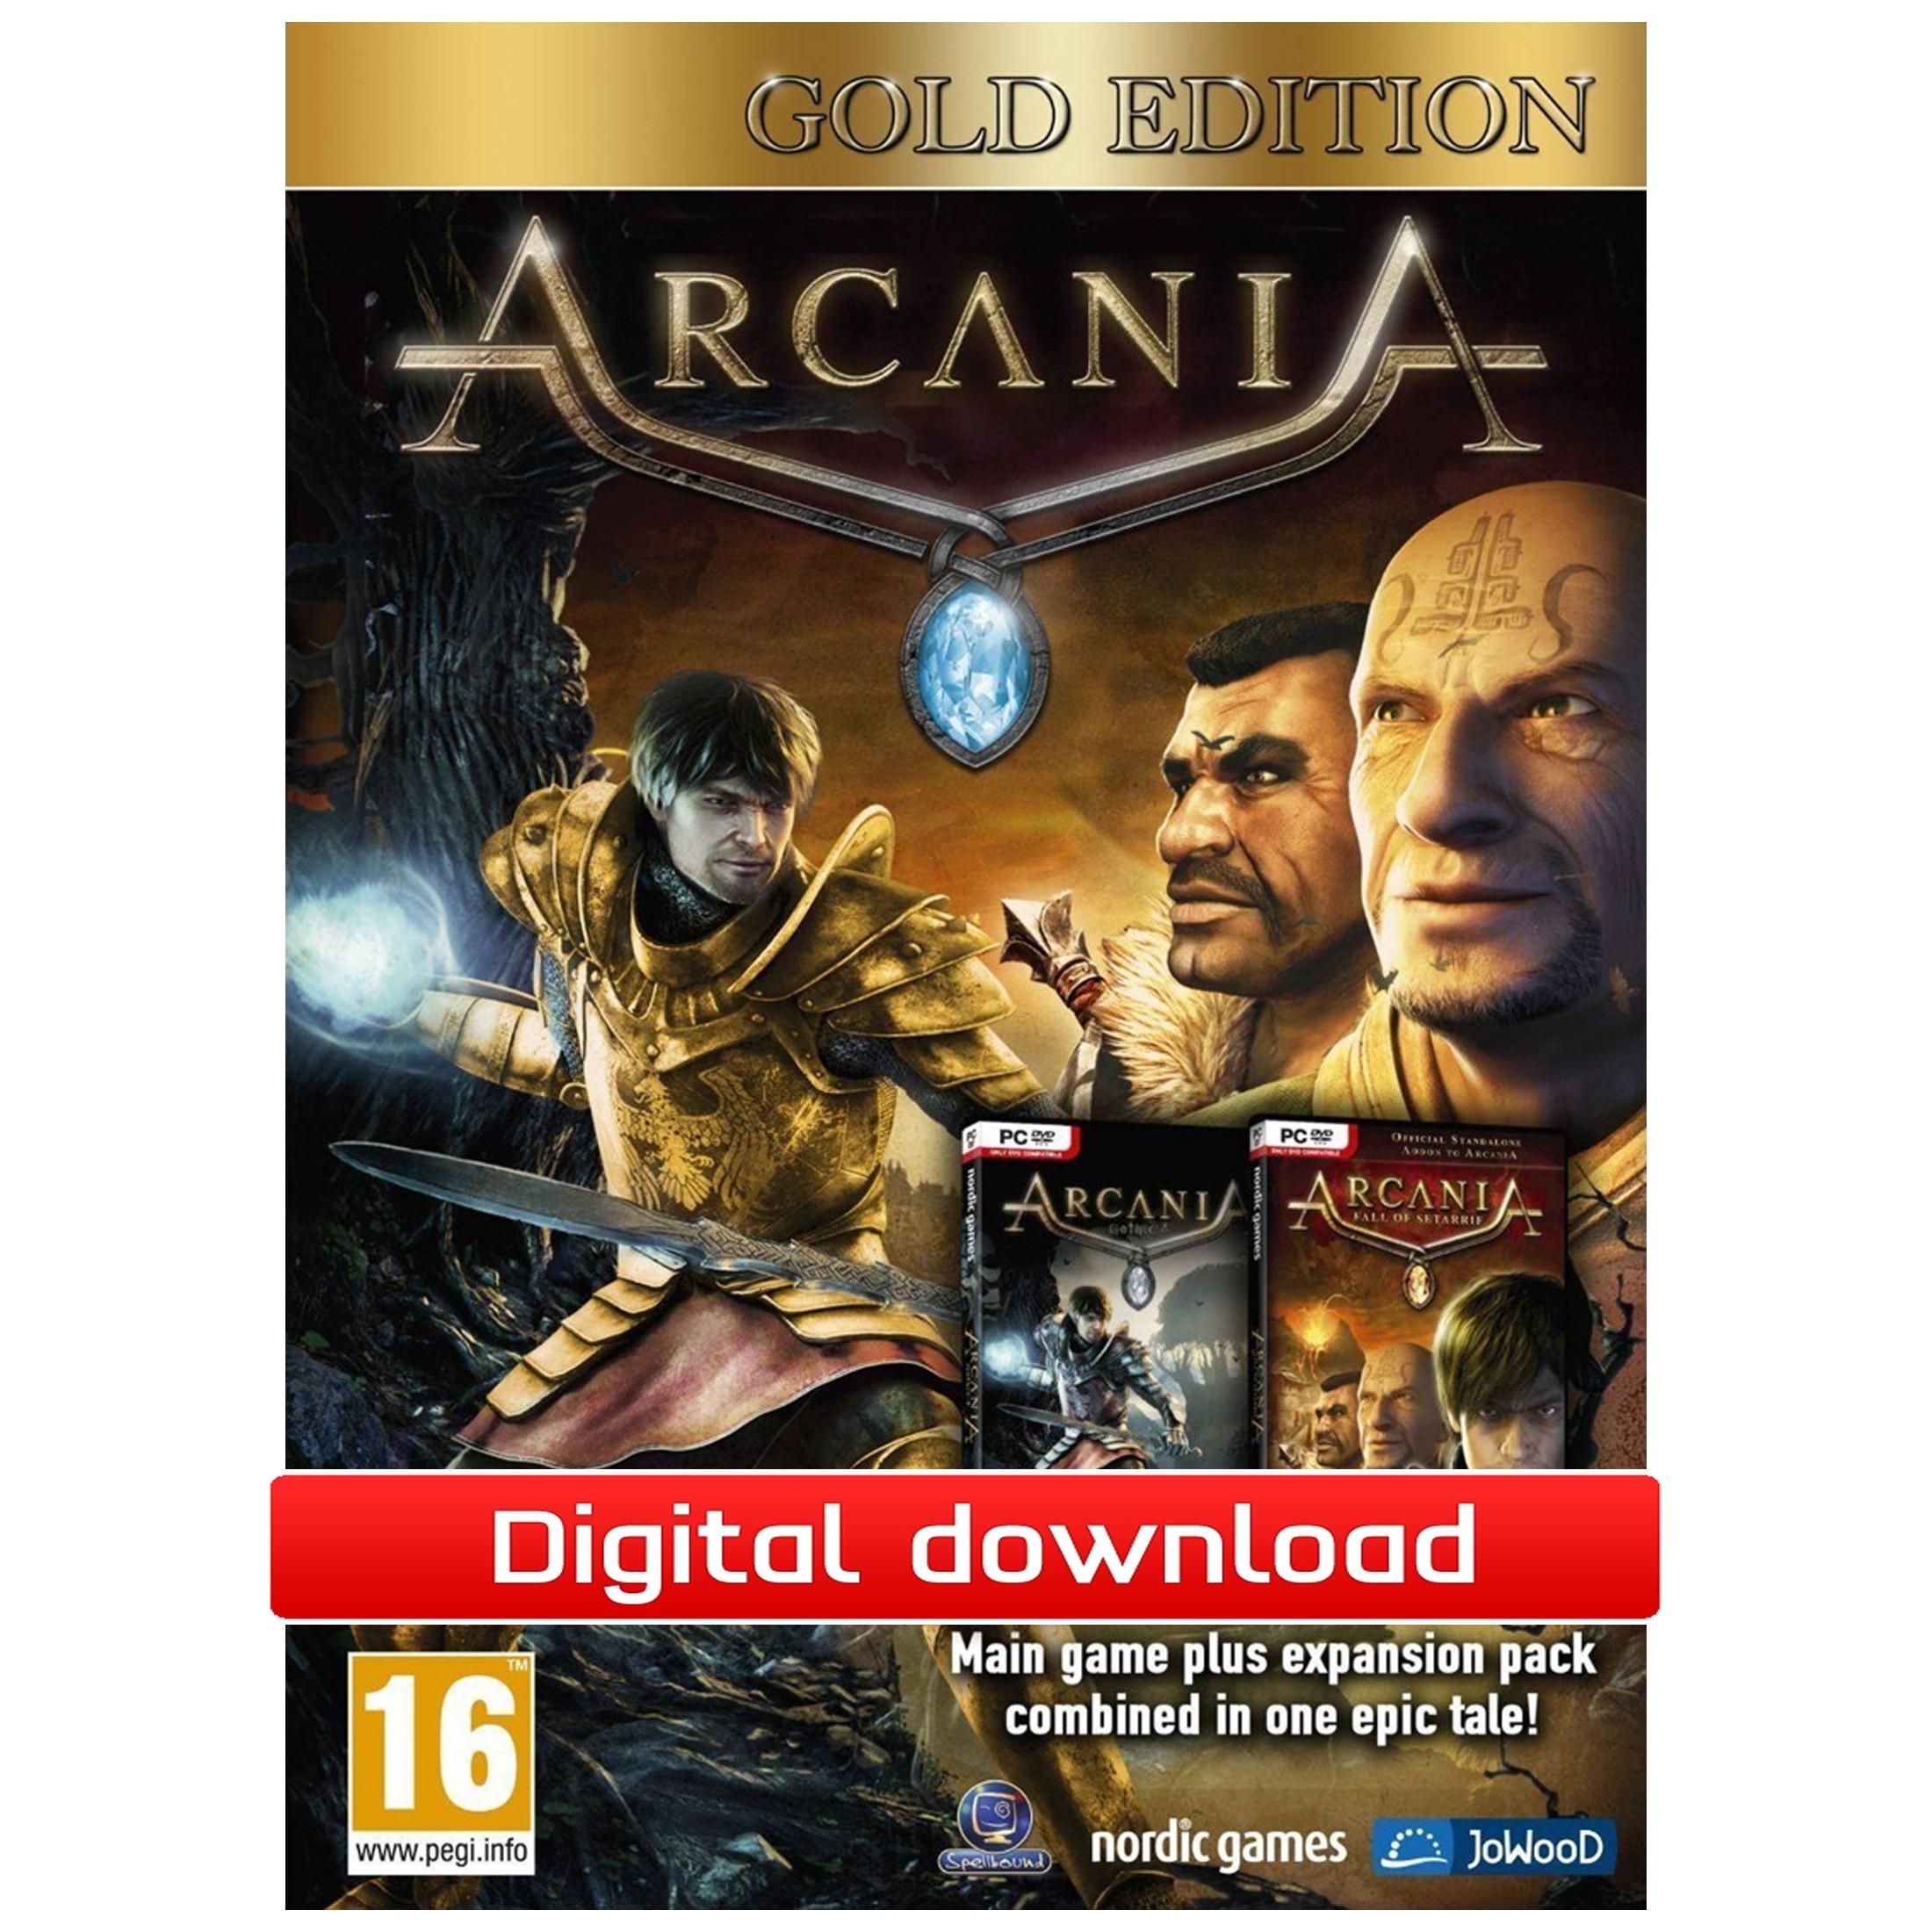 37549 : ArcaniA Gold Edition (PC nedlastning)